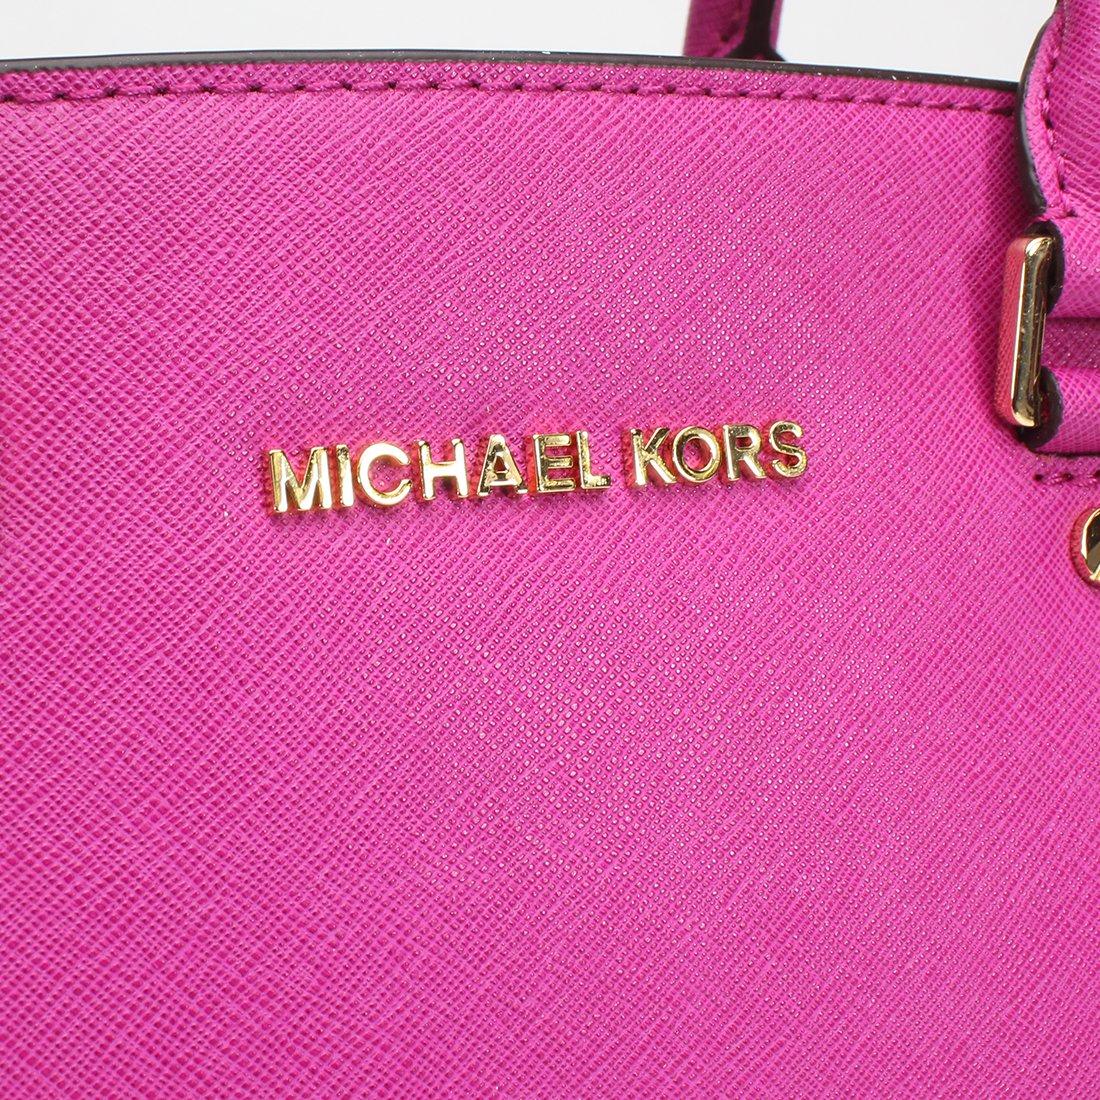 Michael Kors Large Selma Satchel Fuschia Handbags Medium Lilac Authentic